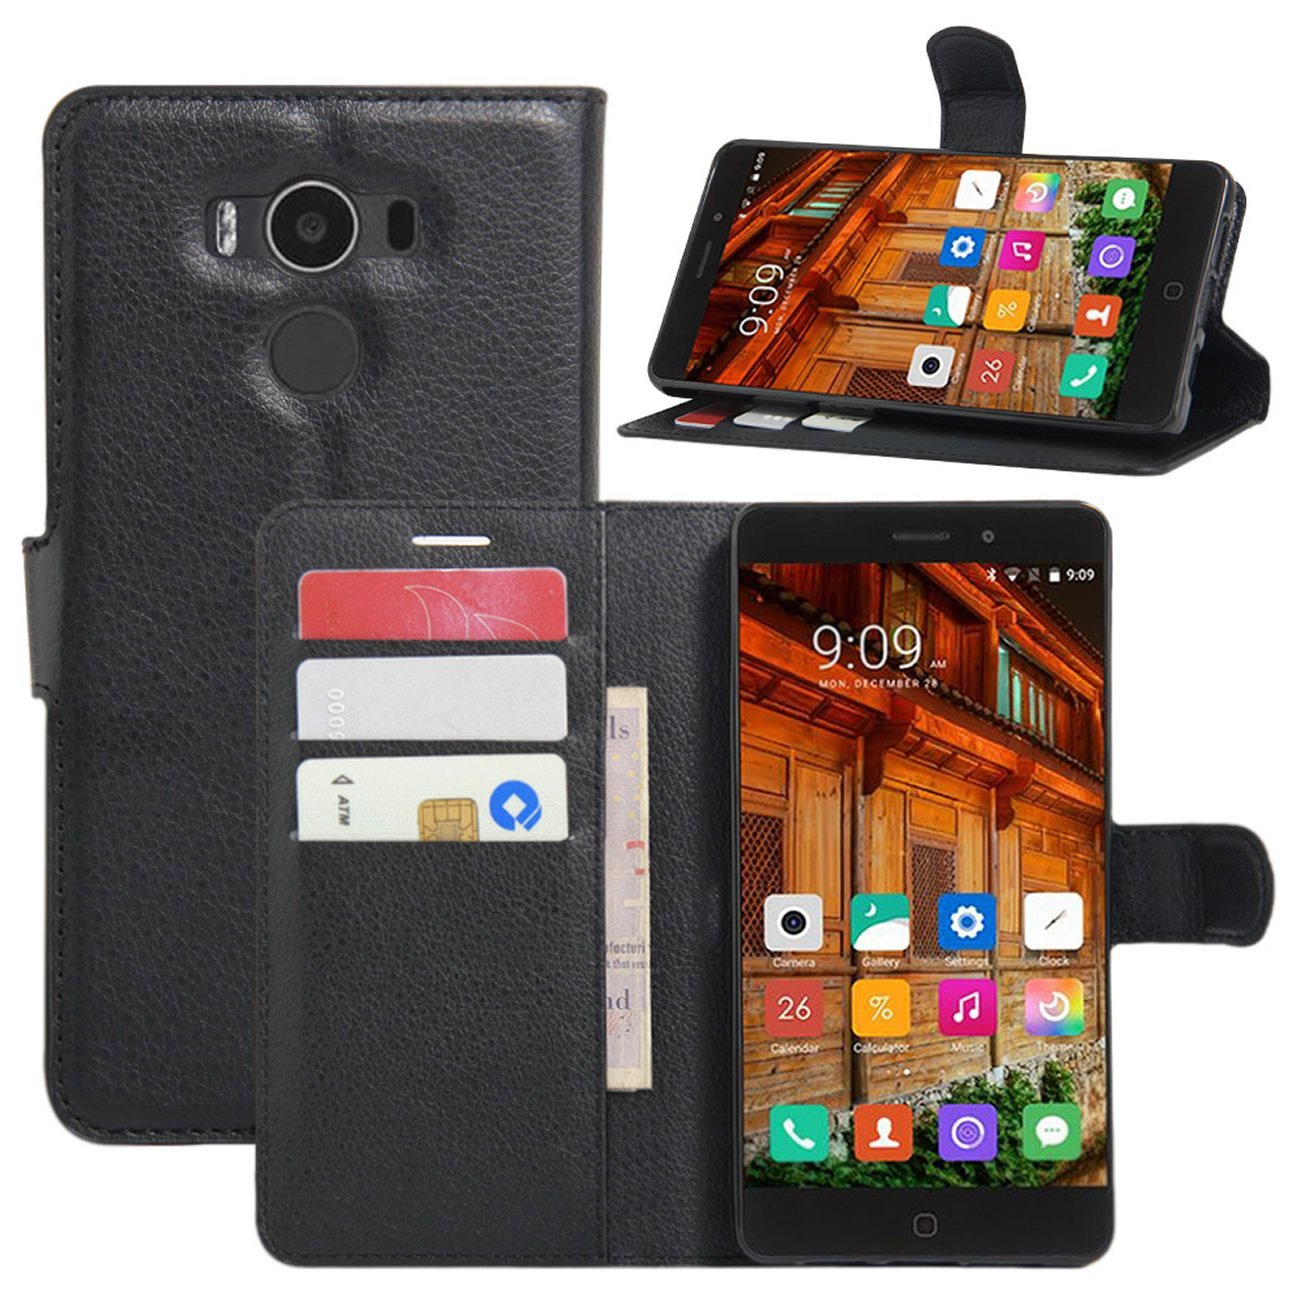 Amazon.com: Elephone P9000 Case, Fettion Leather Wallet Phone Cases ...